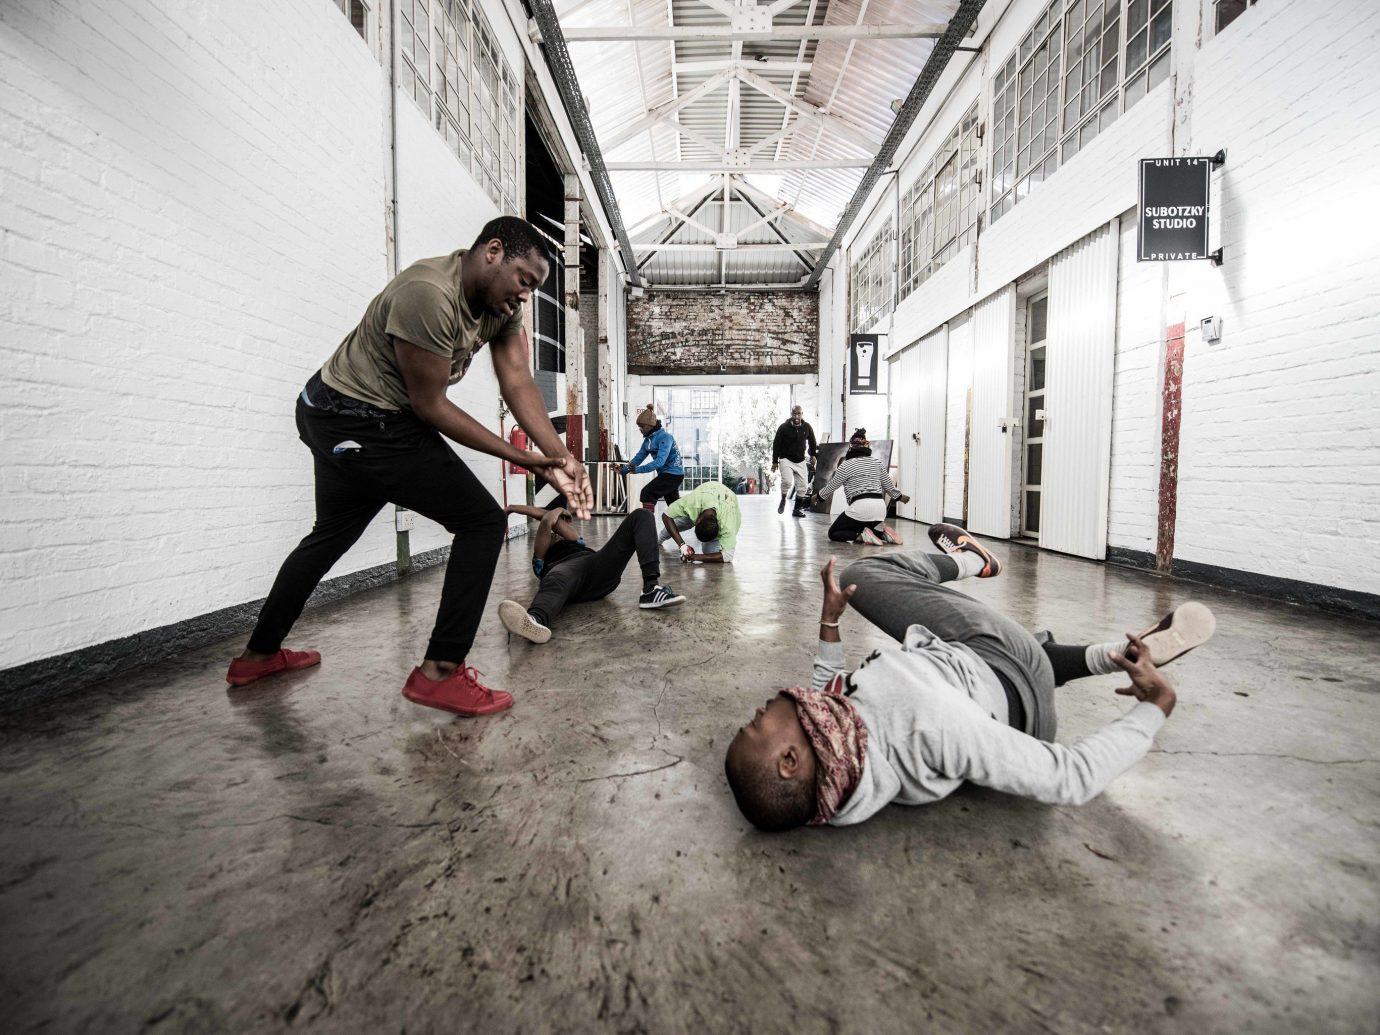 Arts + Culture Trip Ideas ground floor person man sidewalk physical fitness way fun flooring